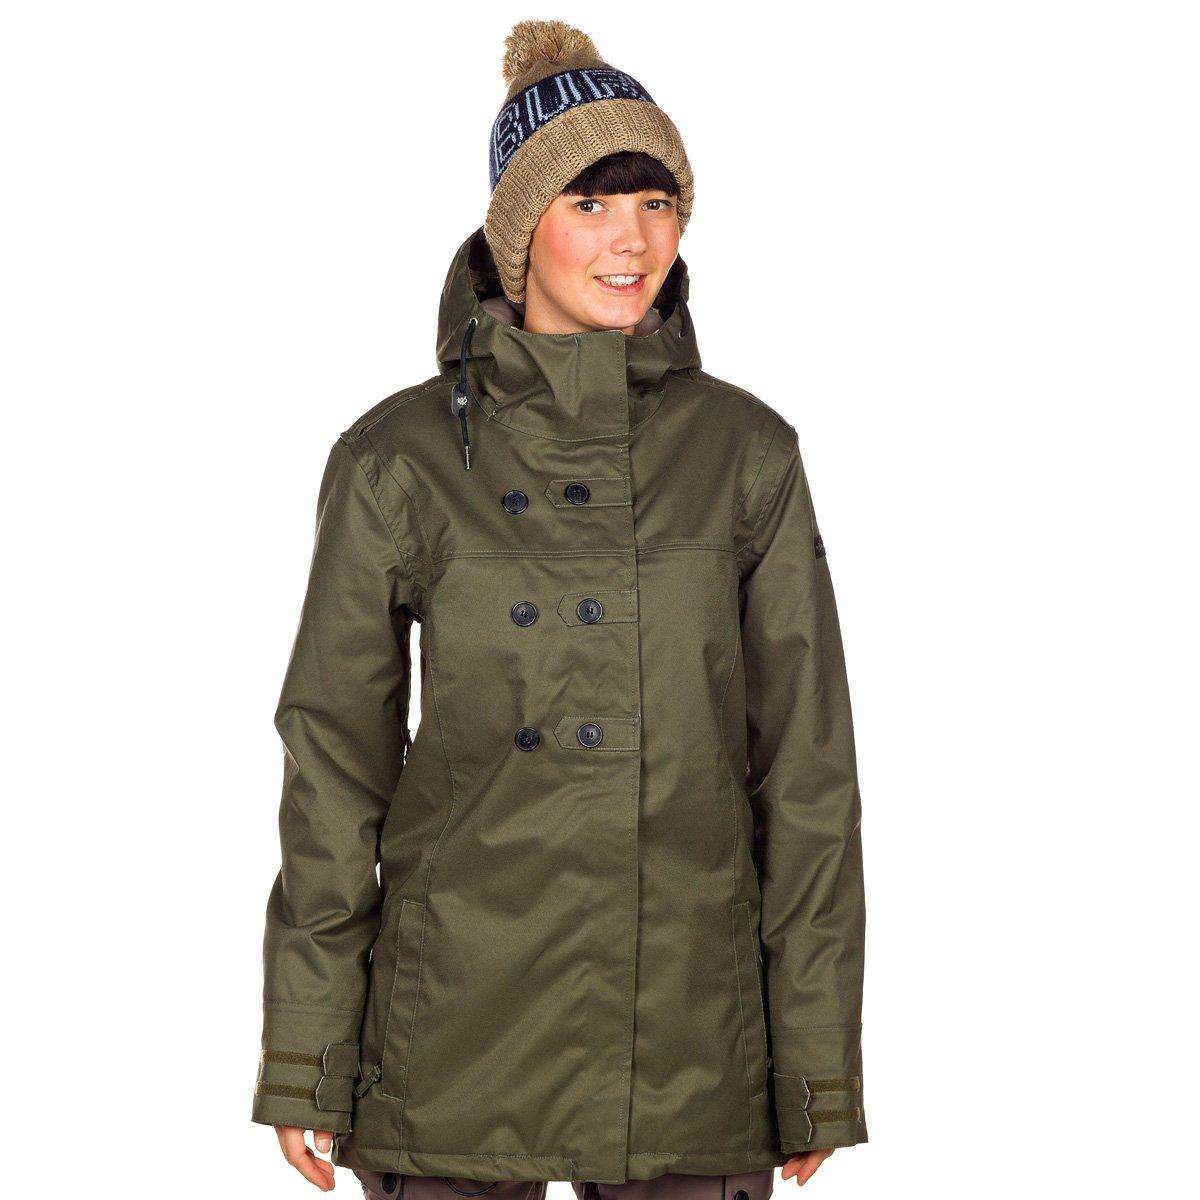 Damen Snowboard Jacke Cappel Thunder Insulated Jacket Women günstig online kaufen